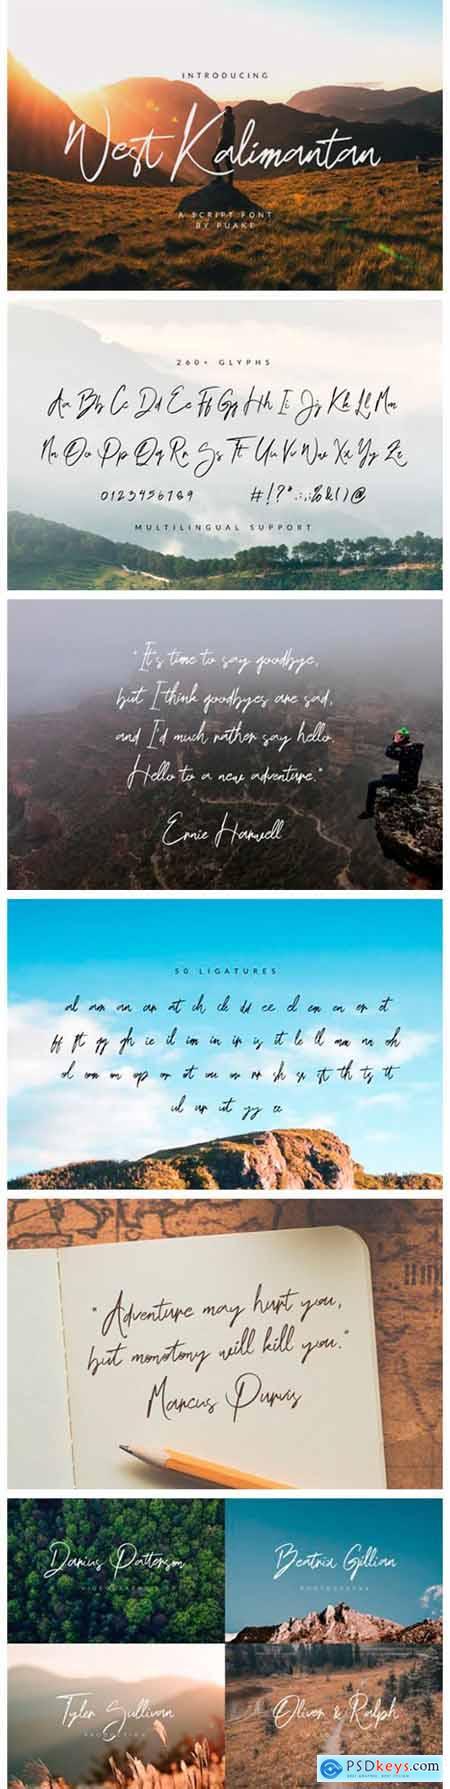 West Kalimantan Font